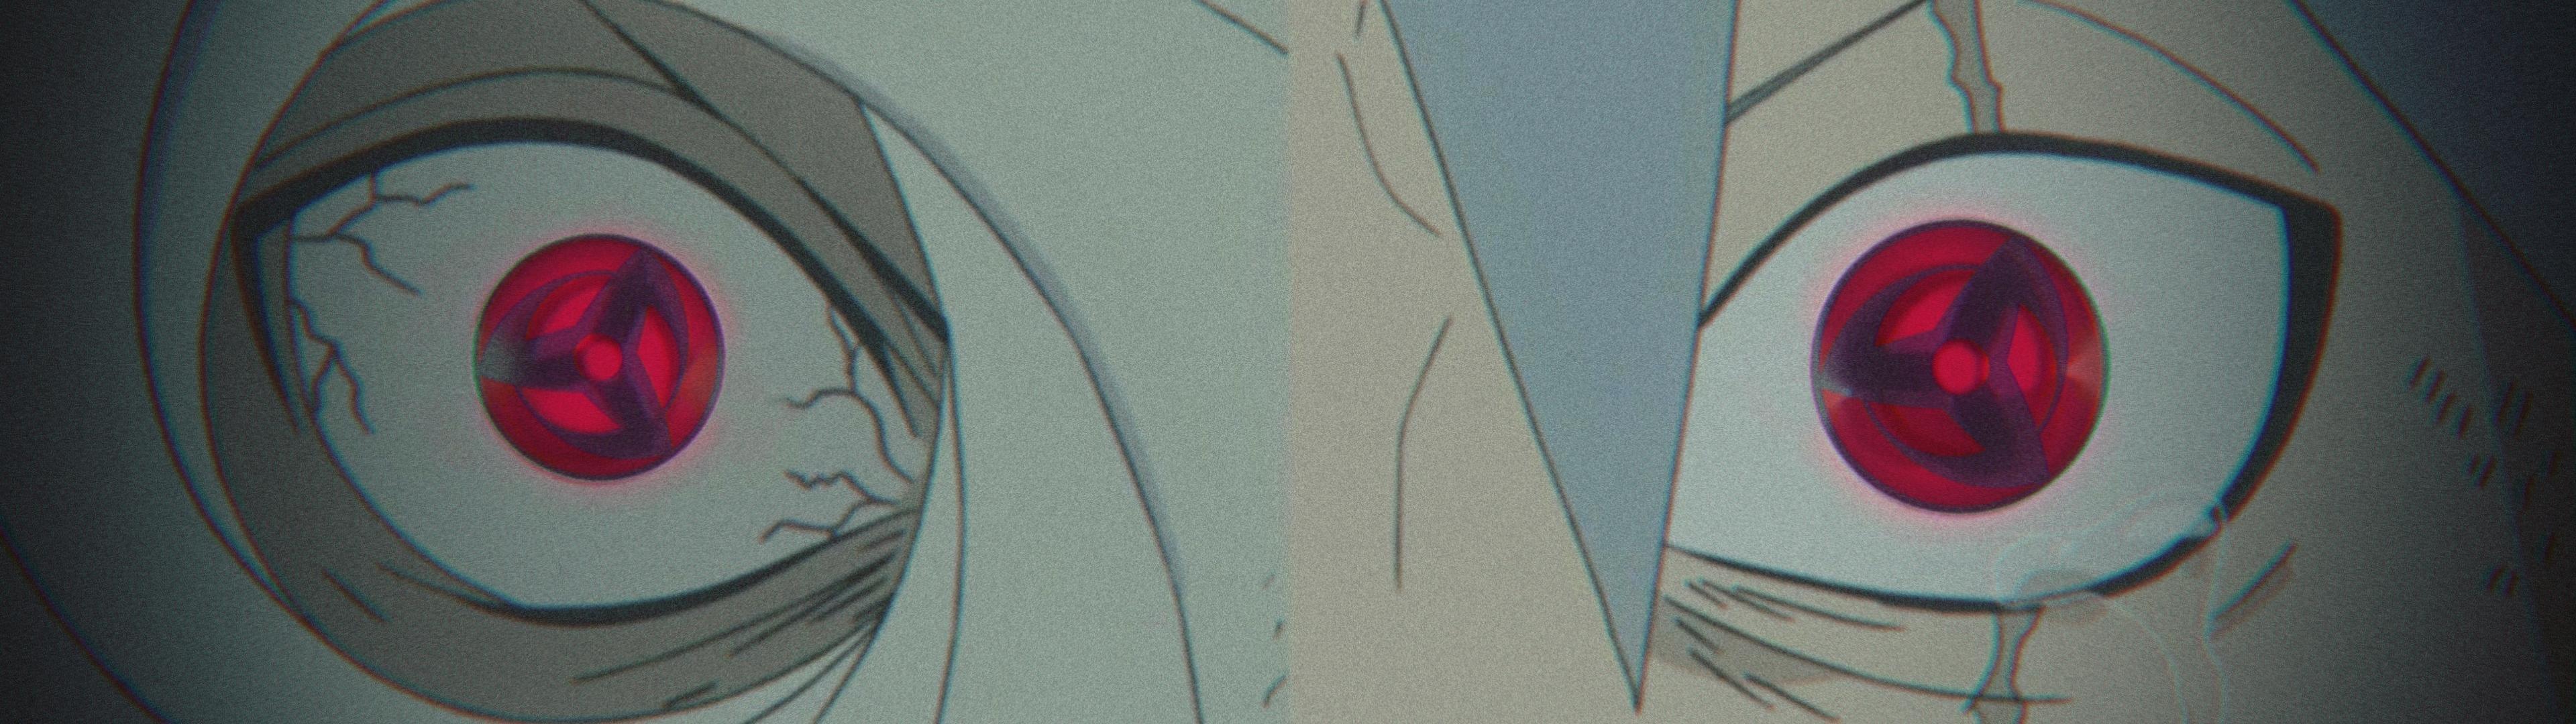 Naruto Dual Screen Wallpapers - Top Free Naruto Dual ...